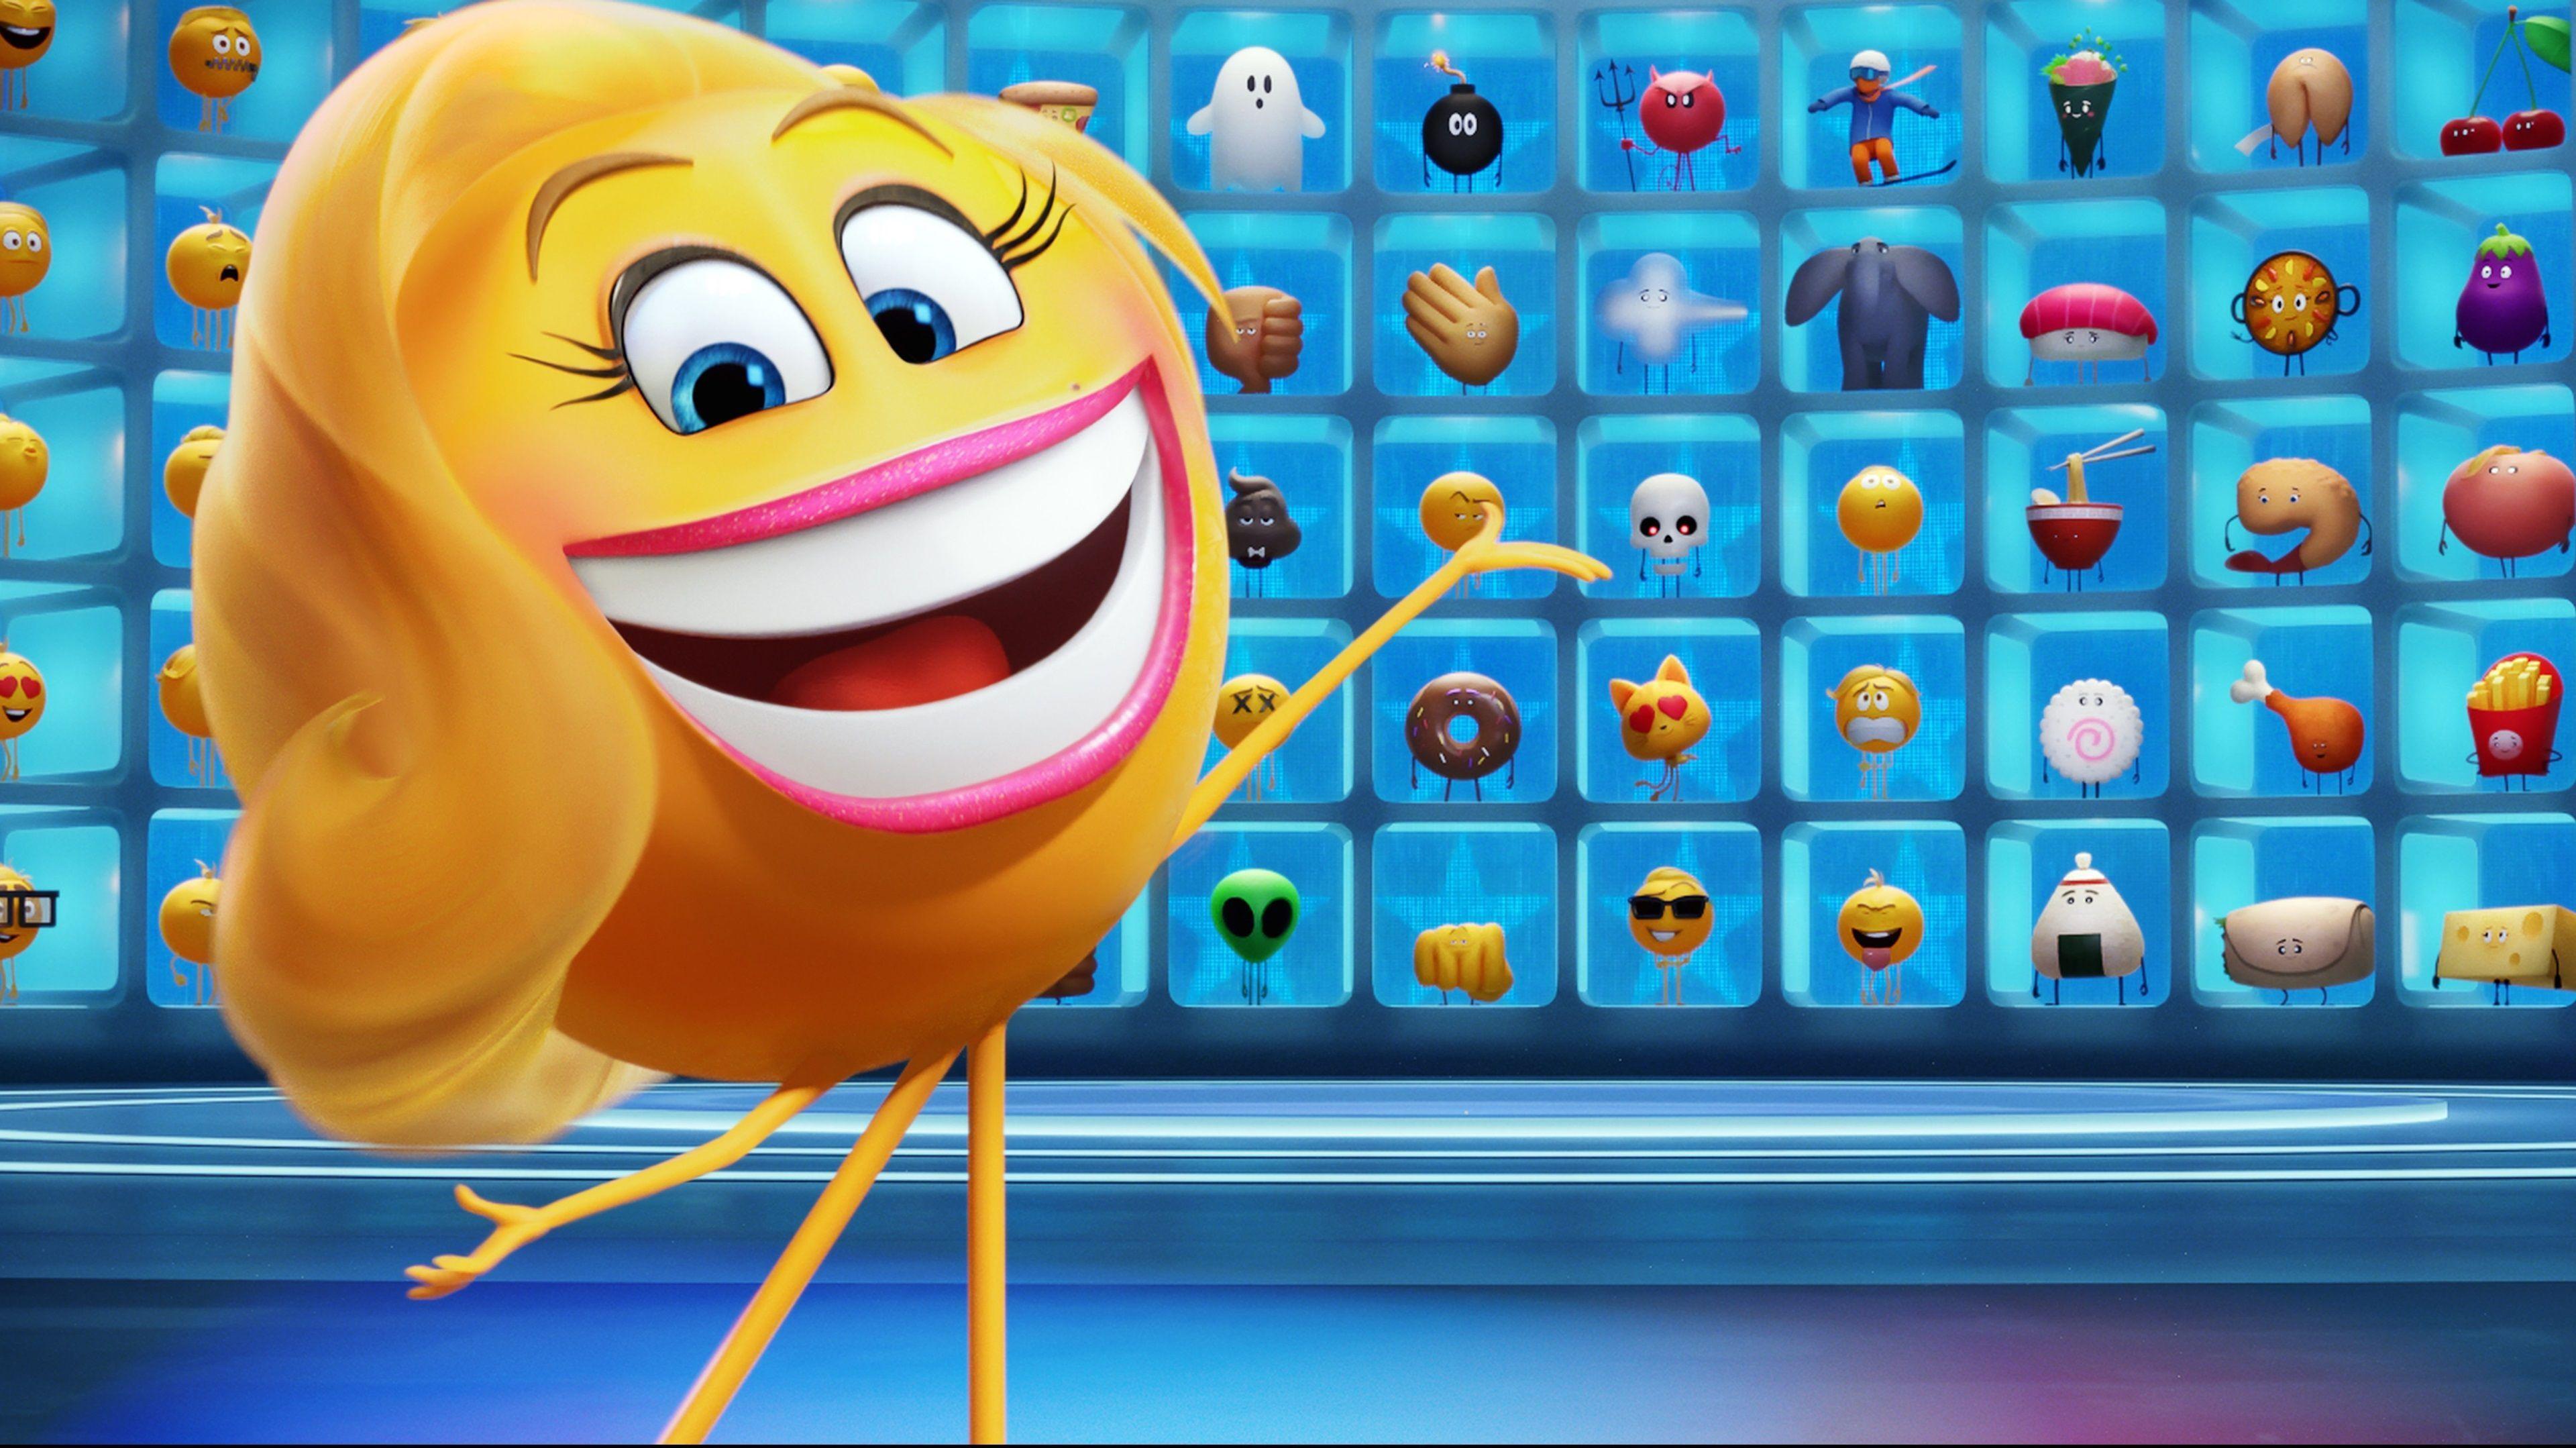 Emoji Desktop Wallpapers - Top Free